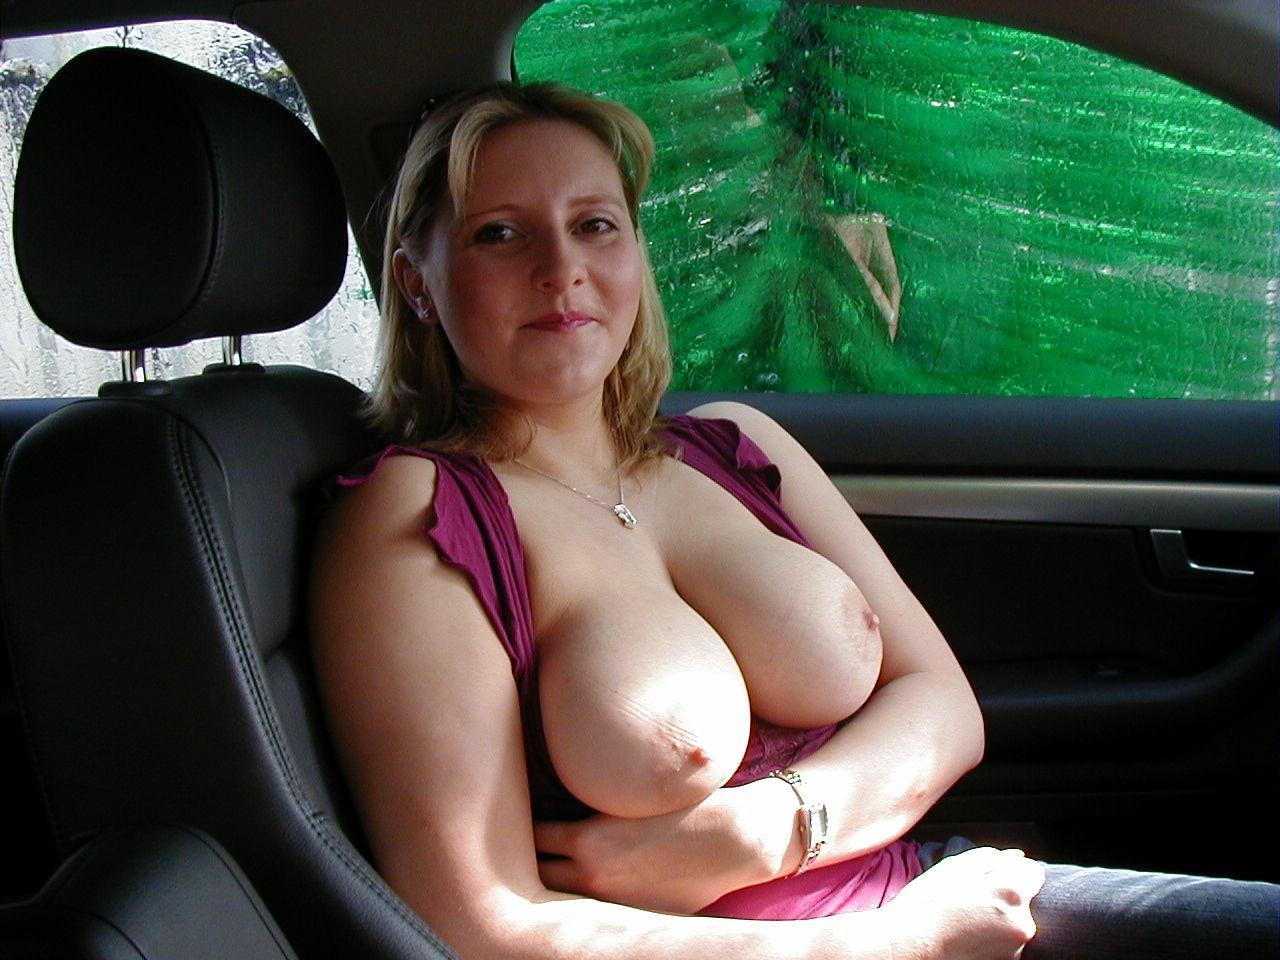 42195_cars49_123_174lo.JPG